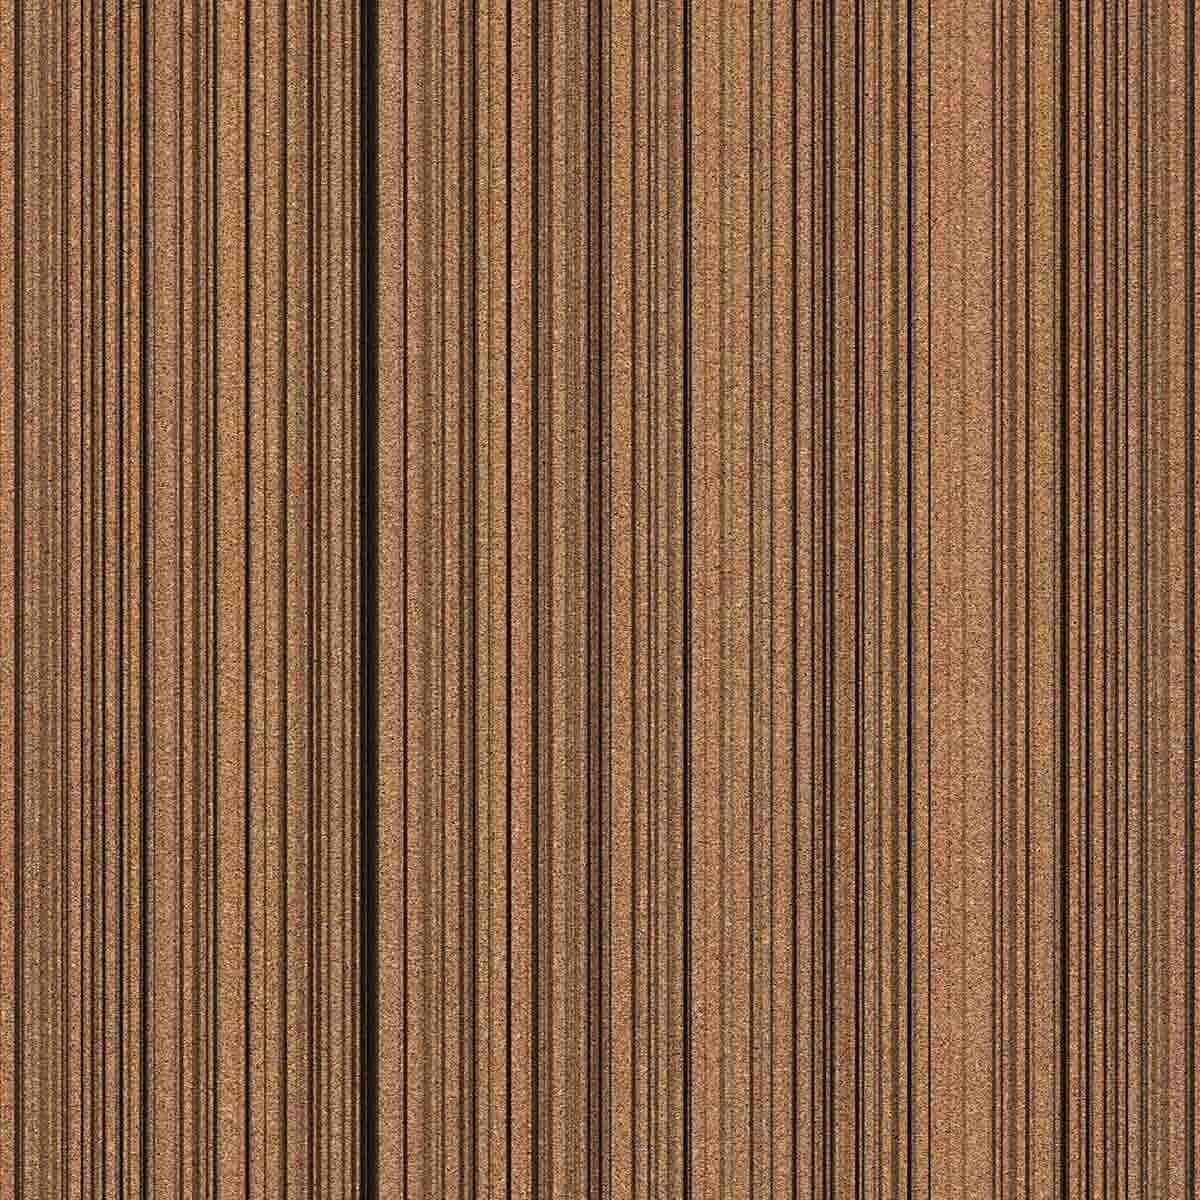 Carta da Parati in Sughero 0,5 mm - Straight Simple Cork